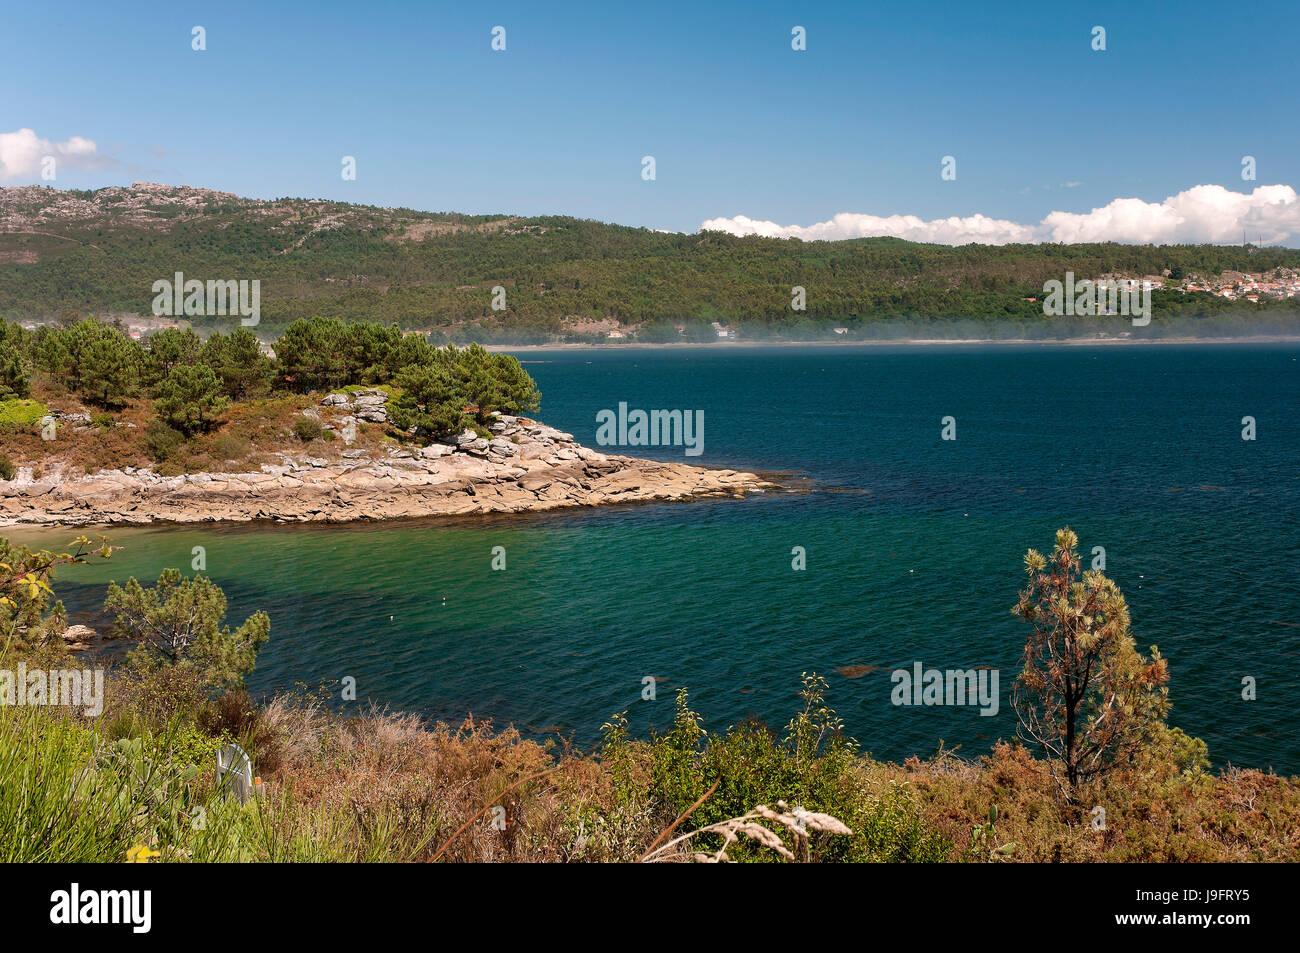 Coastal view, Muros, La Coruna province, Region of Galicia, Spain, Europe - Stock Image